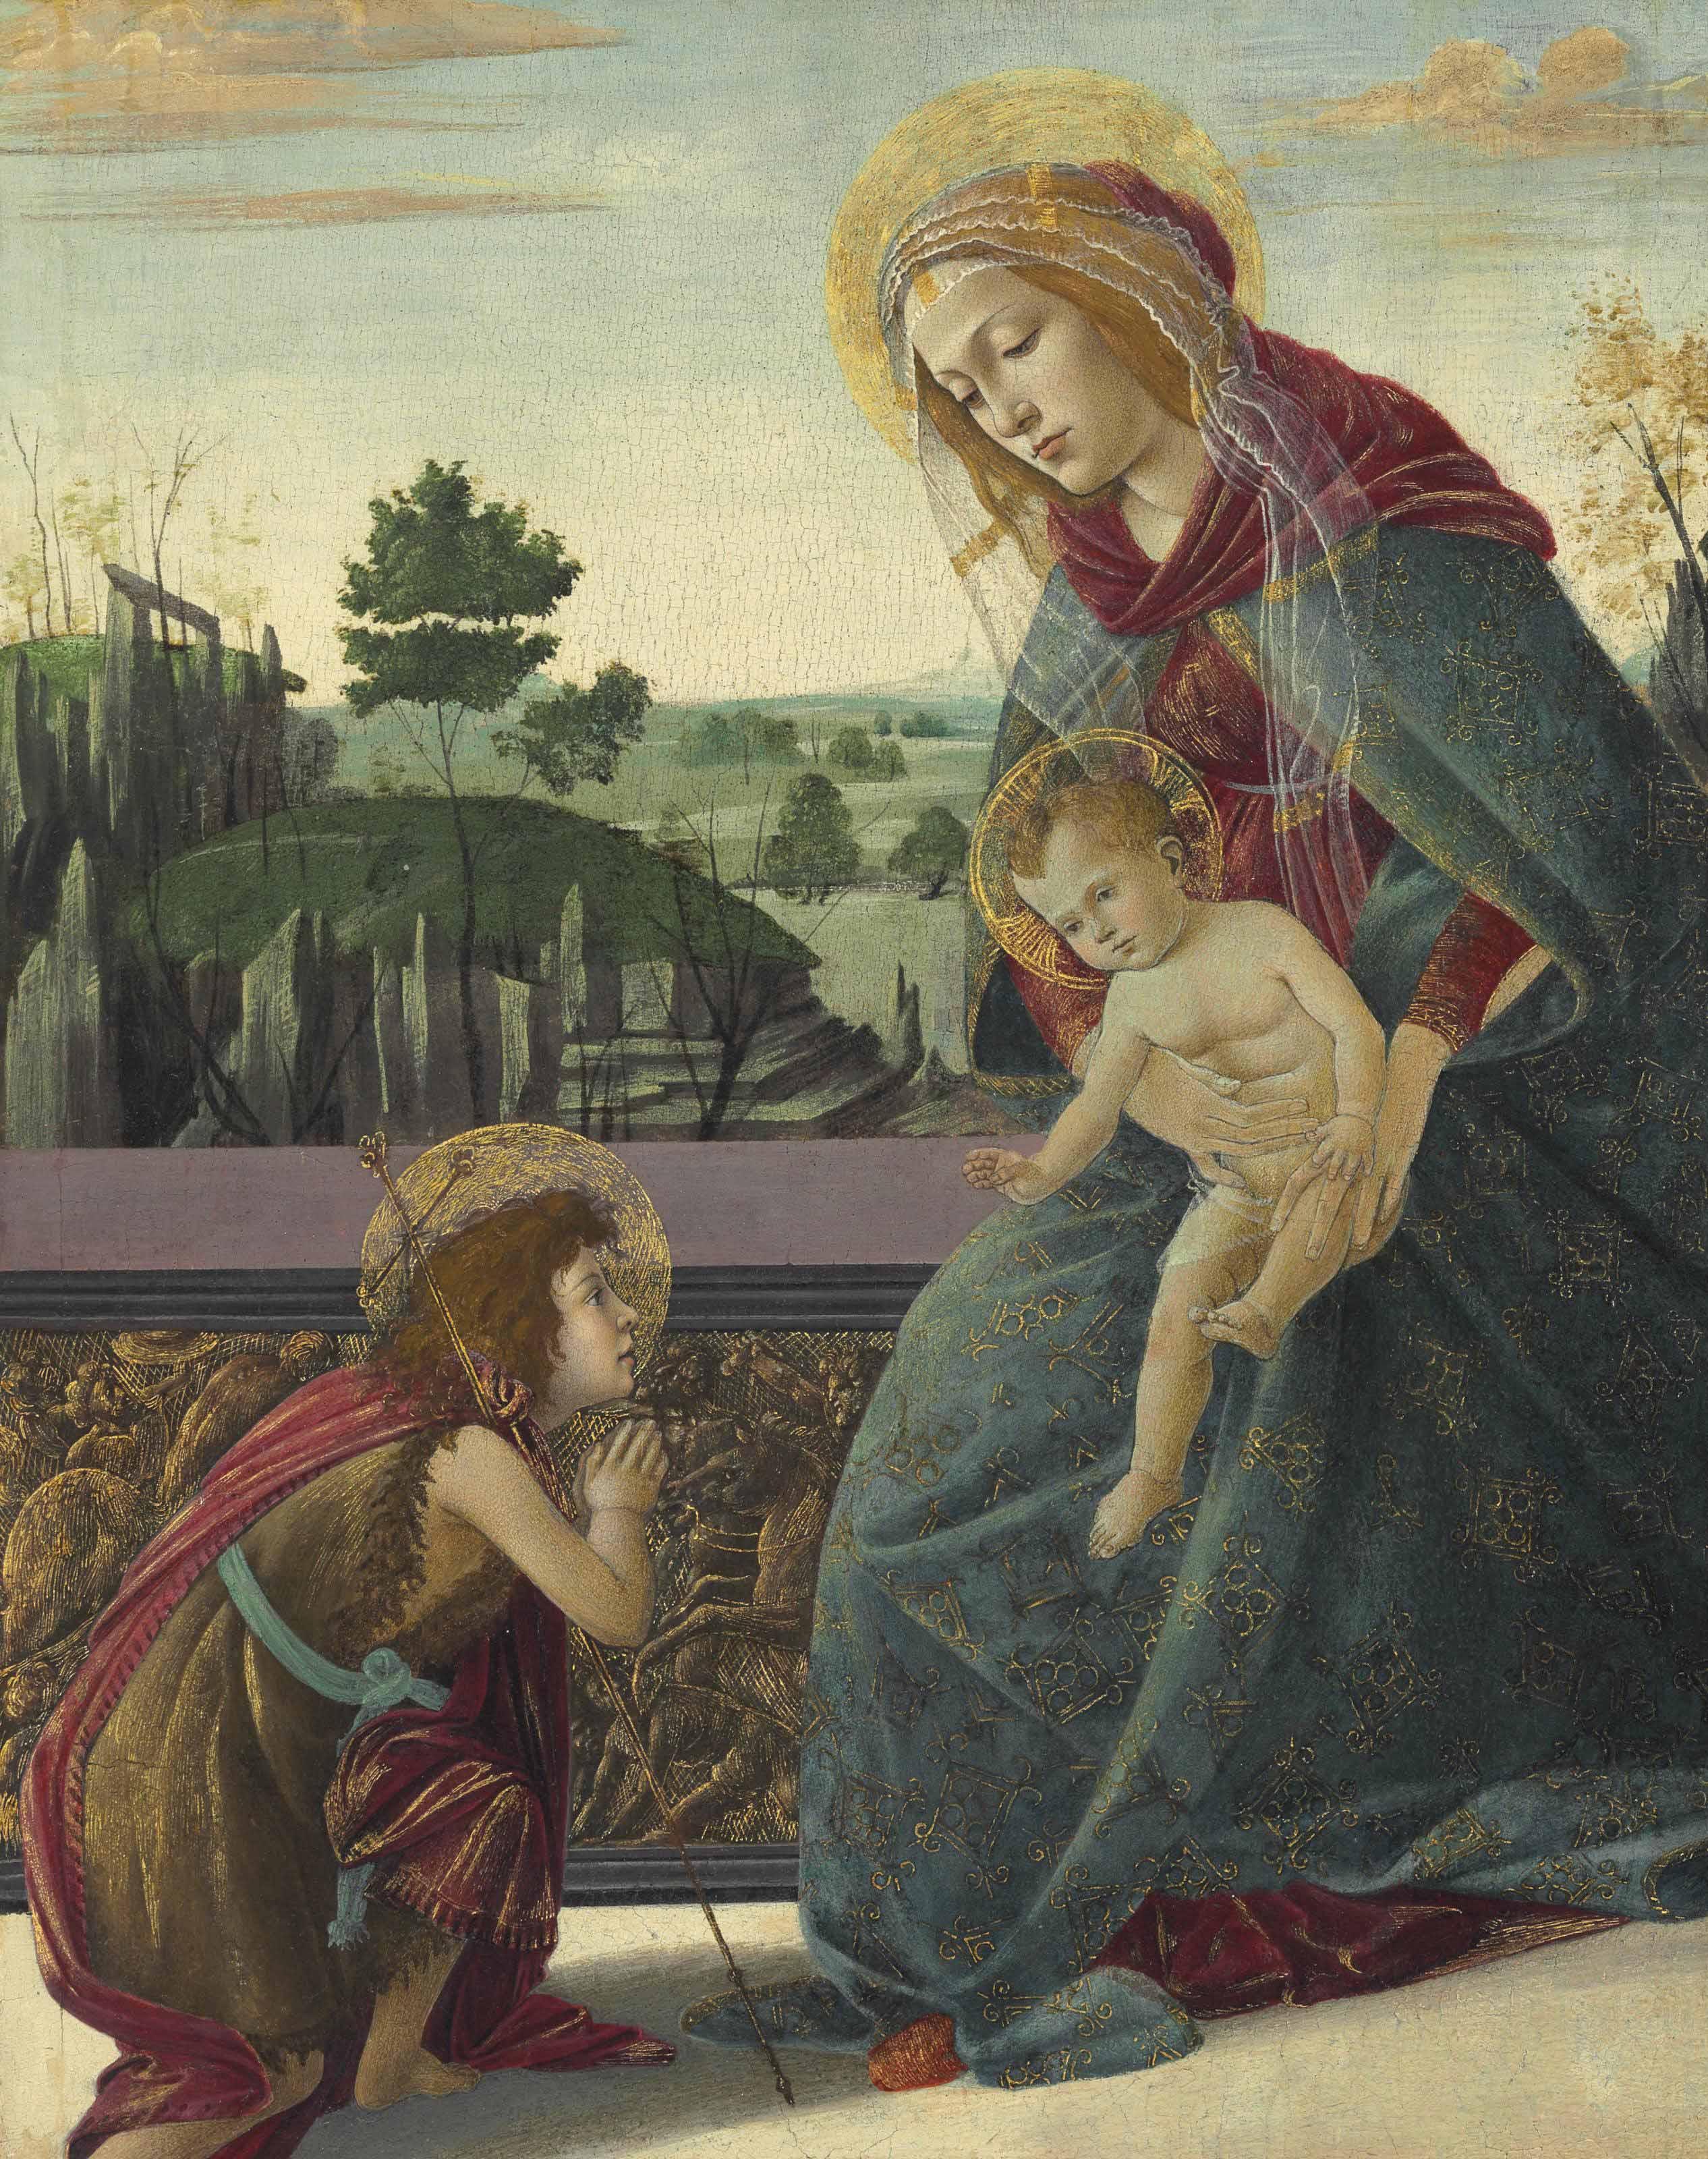 Alessandro Filipepi, called Sandro Botticelli (Florence 1444/45-1510)